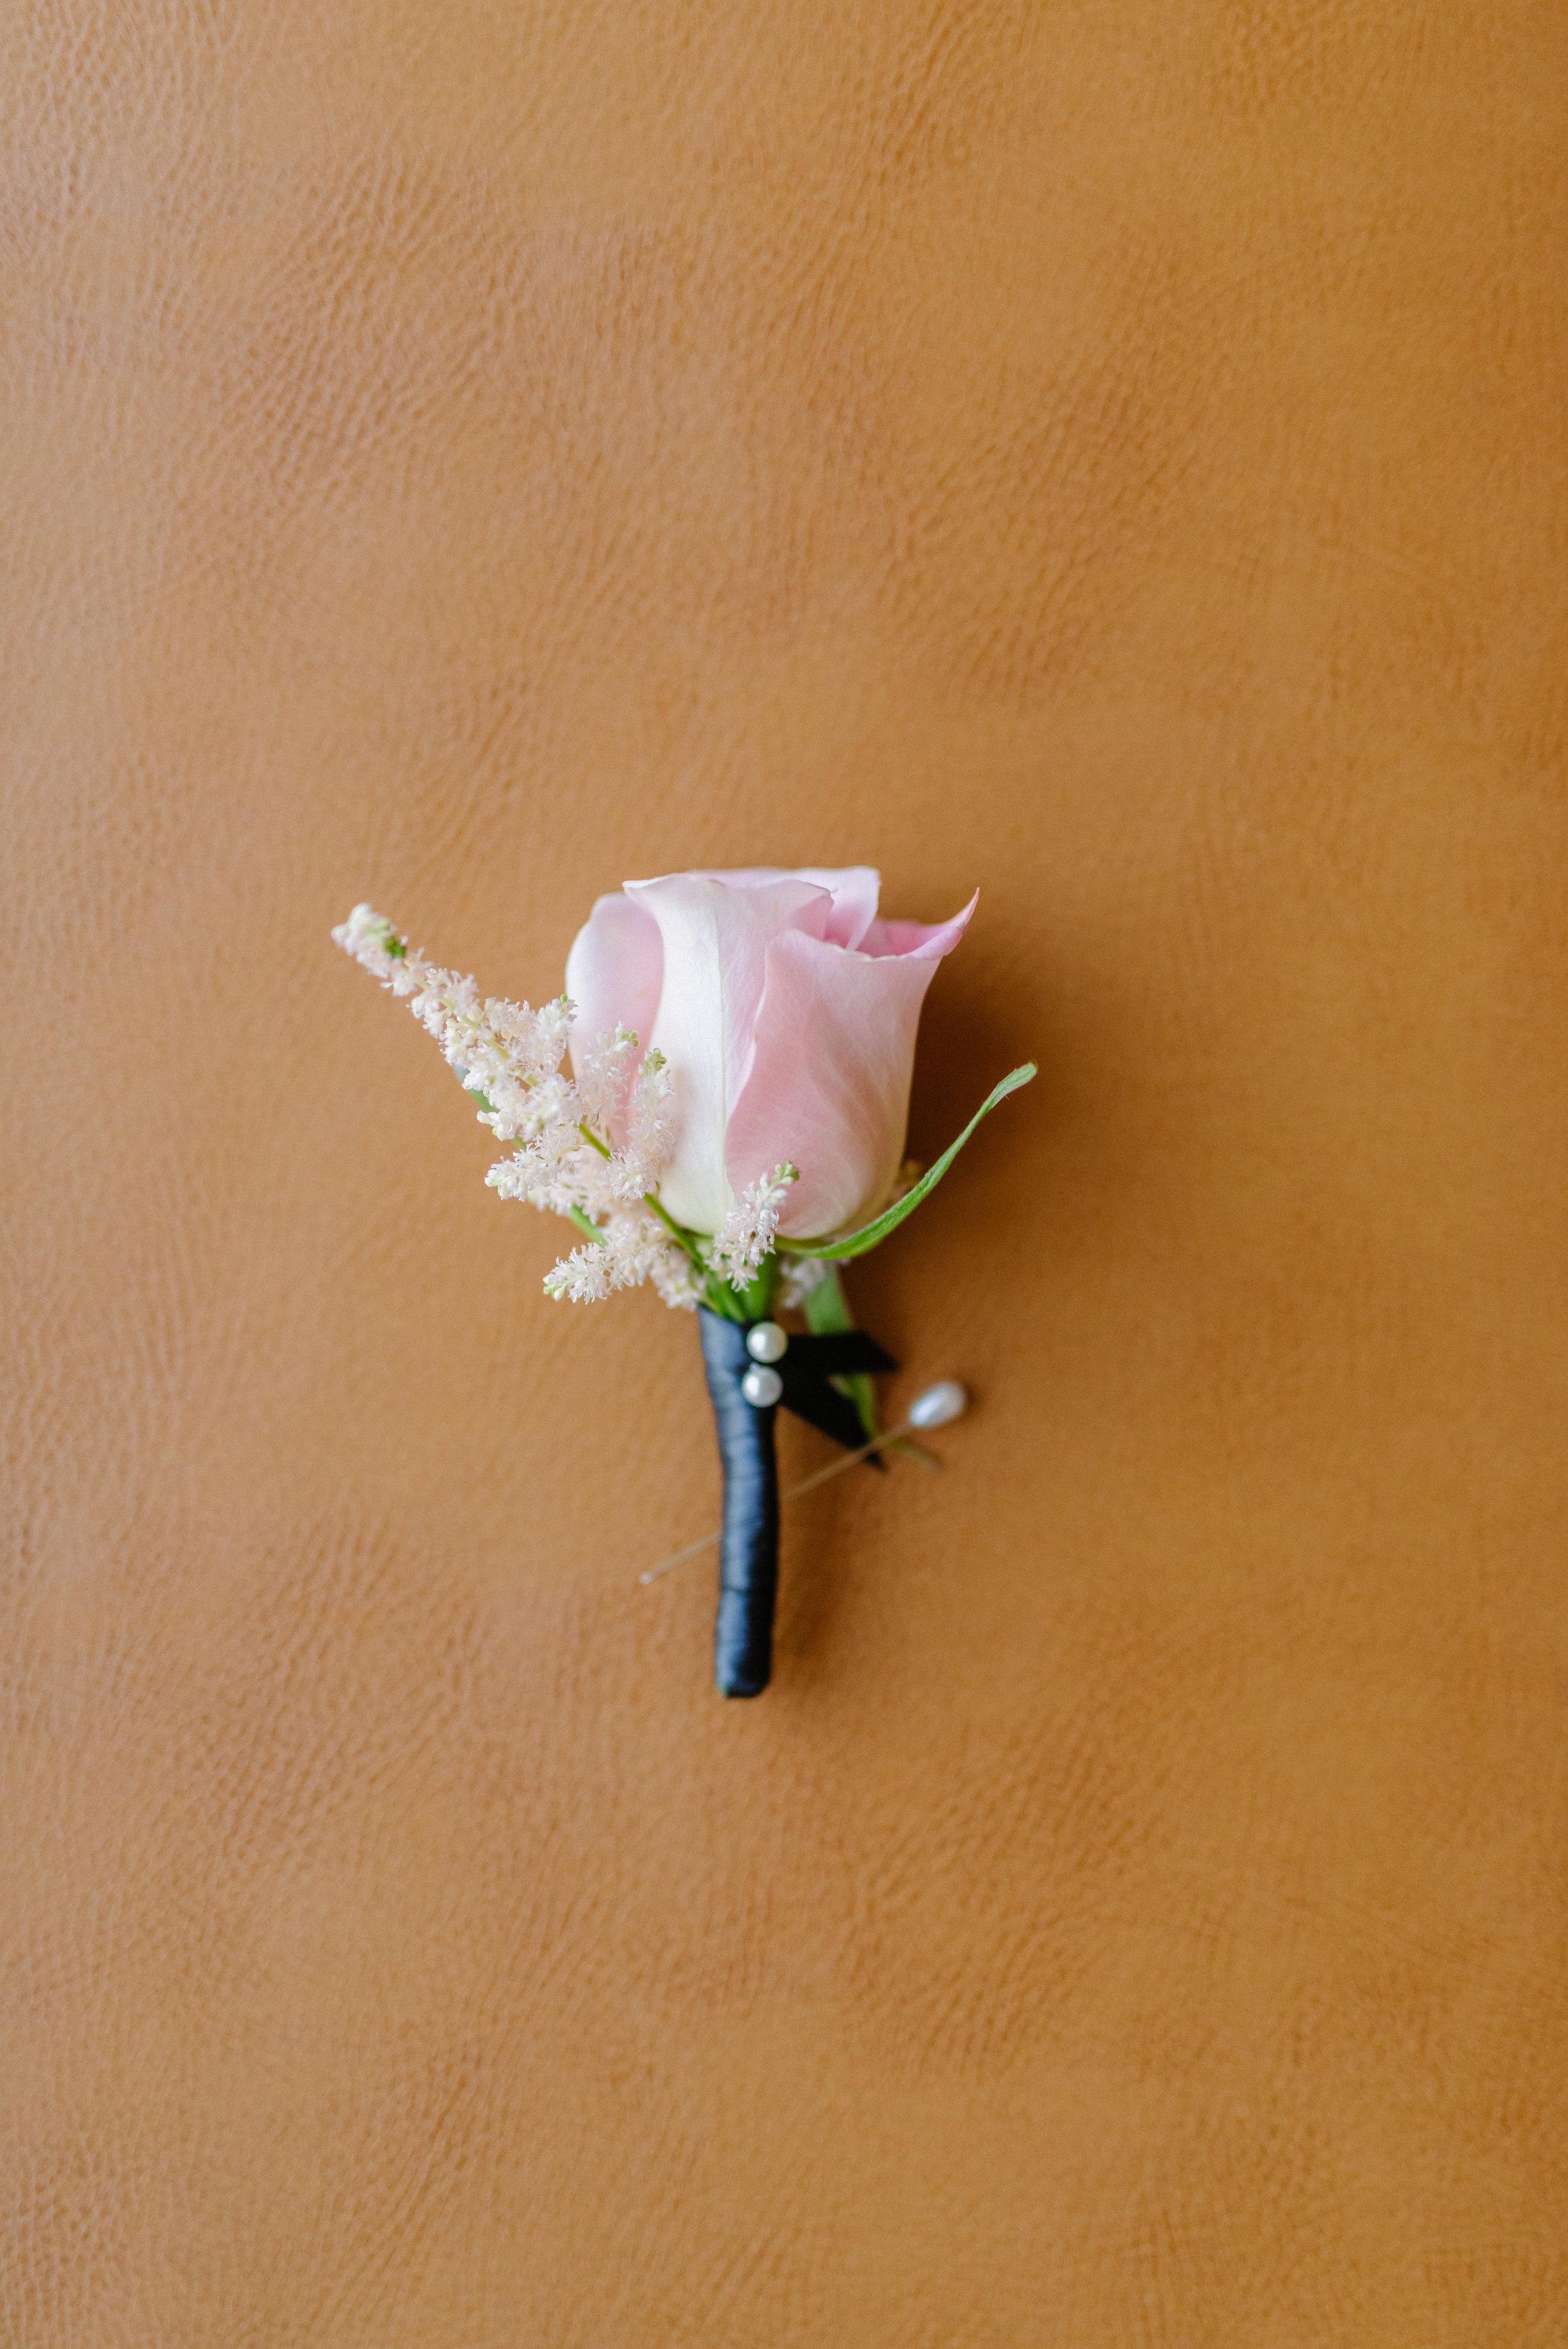 photo courtesy of LovisaPhoto.com